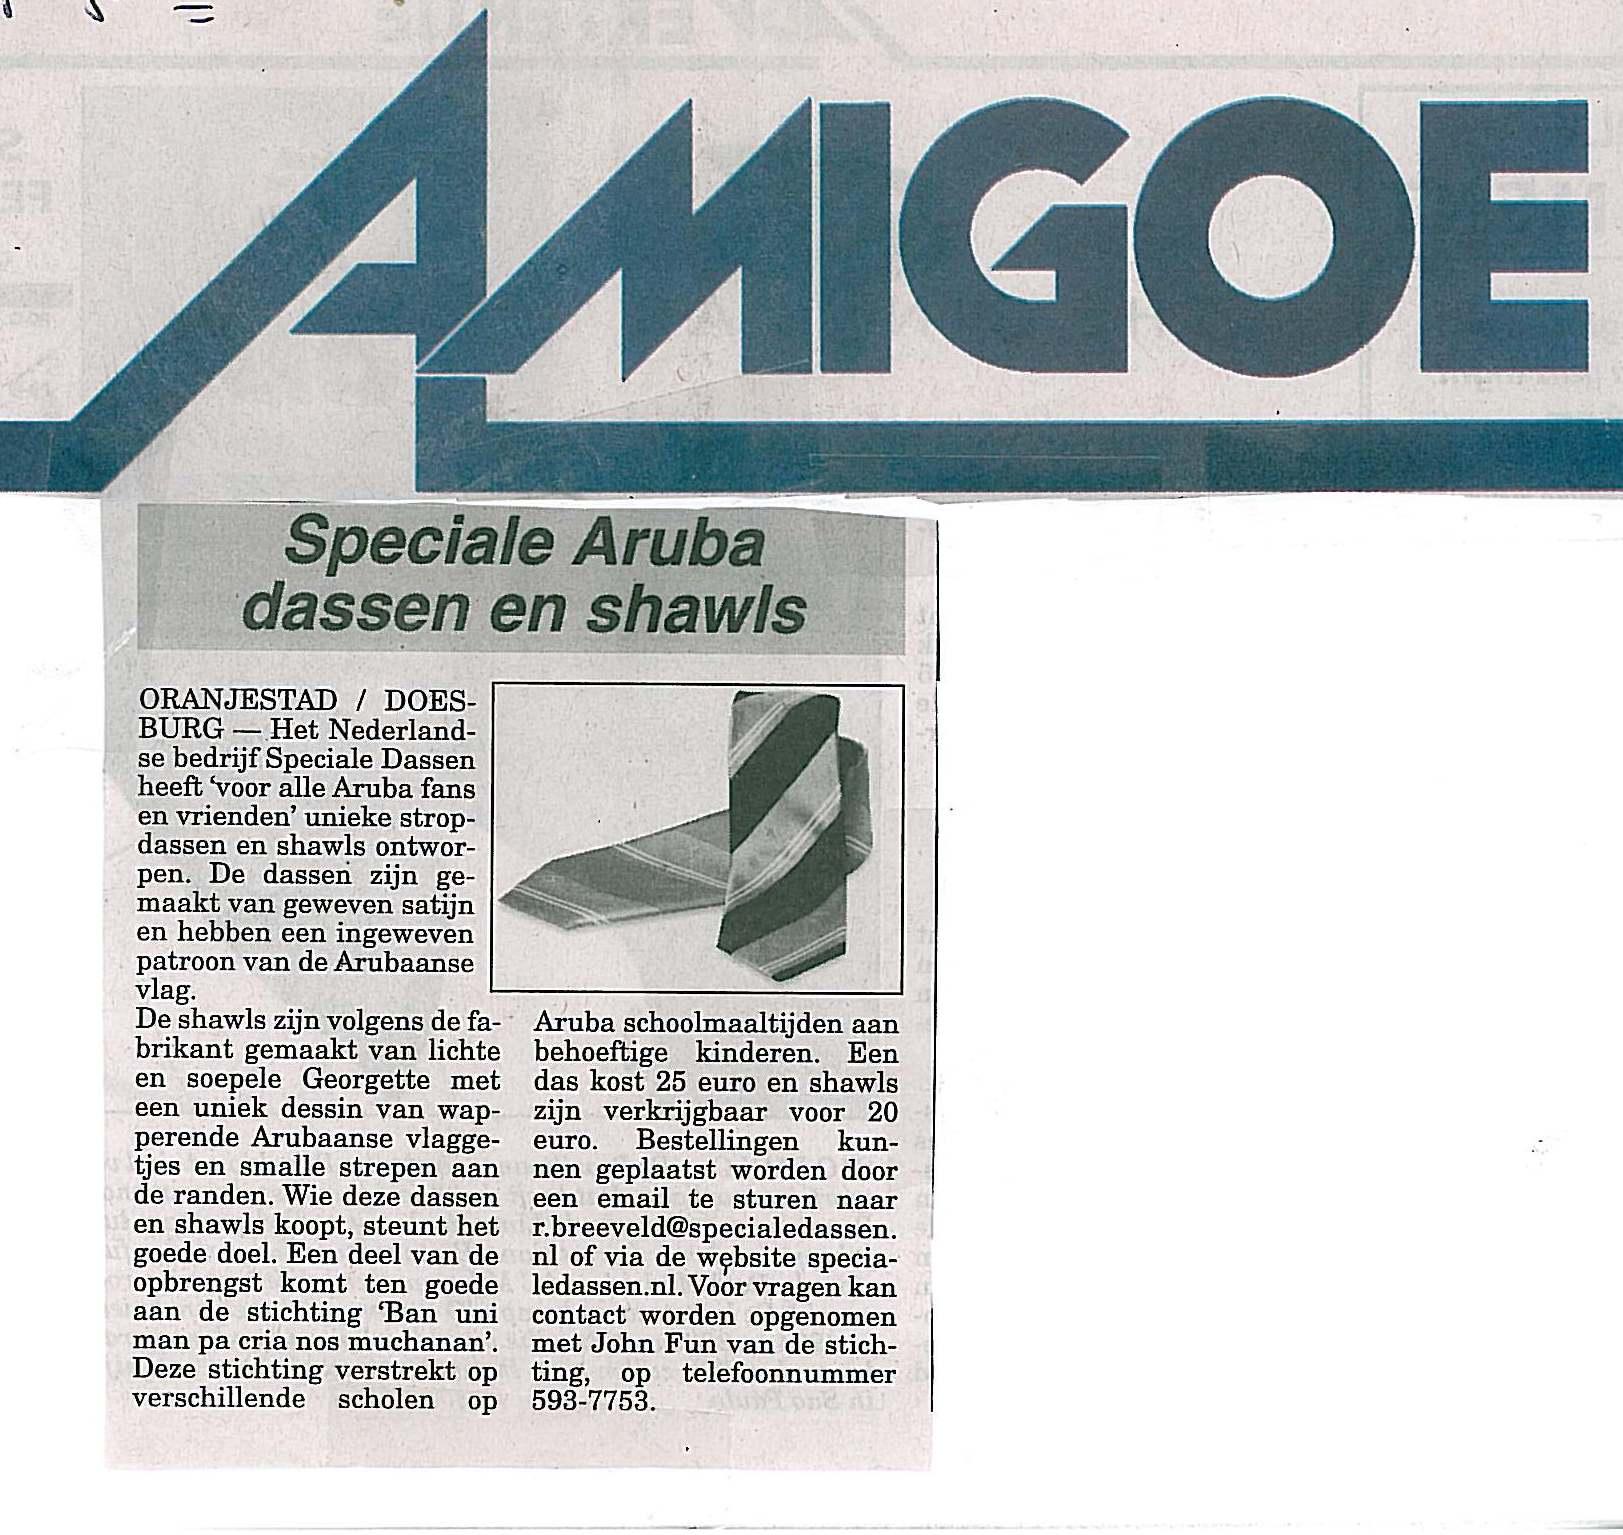 Aruba Media: Amigo